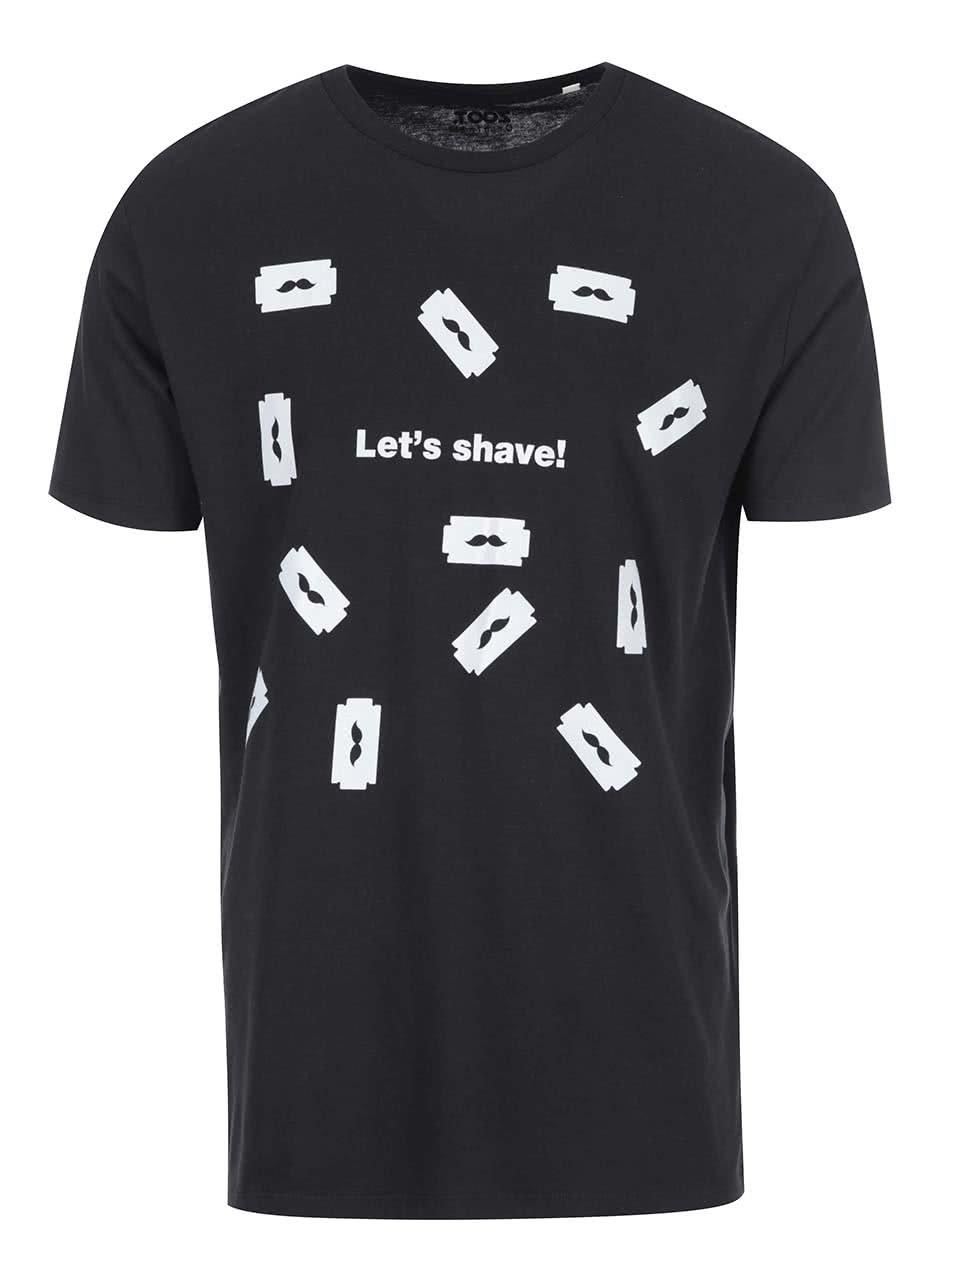 Černé pánské triko ZOOT Originál Razor